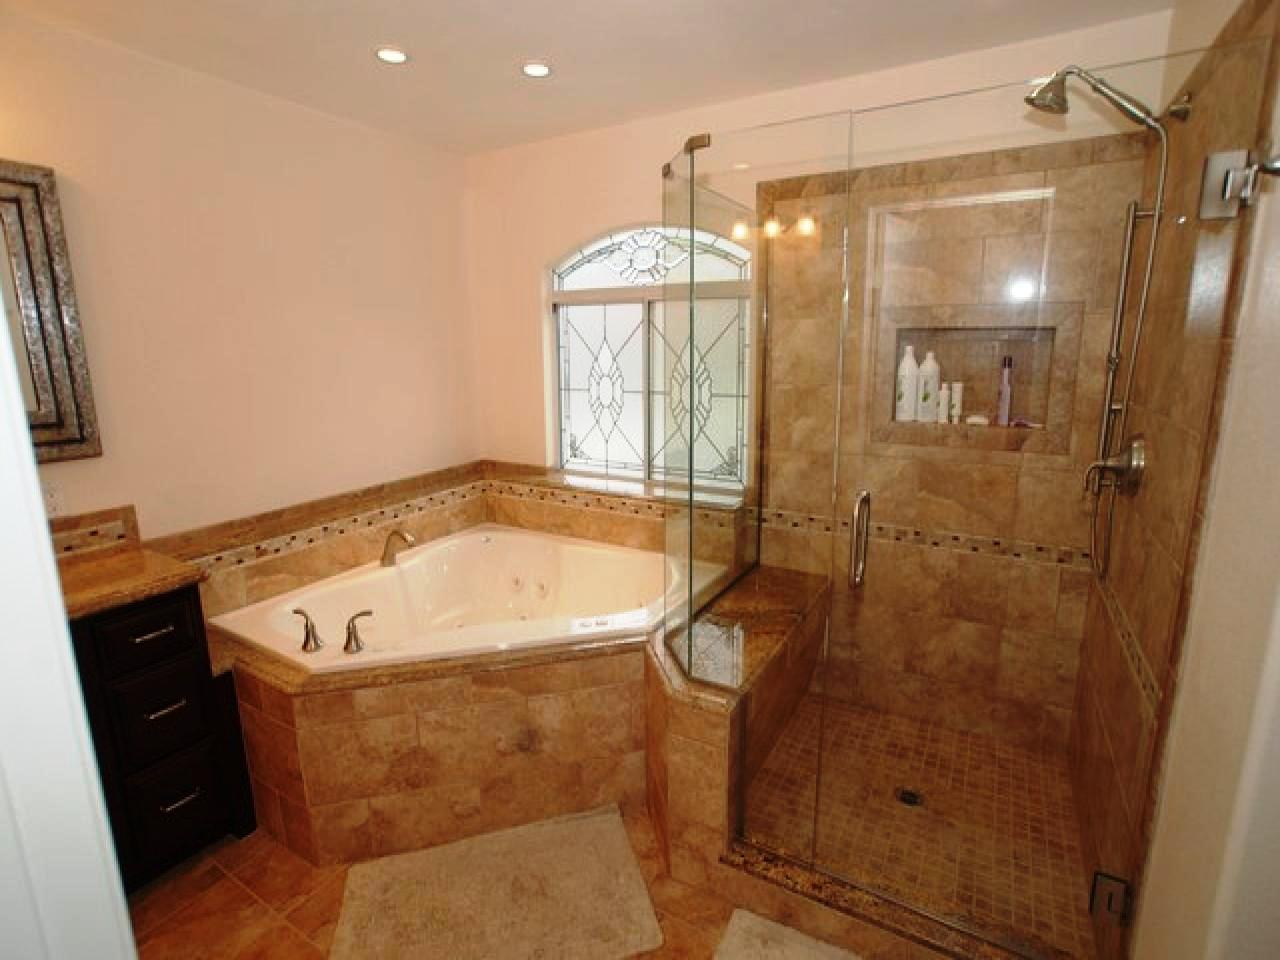 Corner Tub Shower Dimensions Schmidt Gallery Design